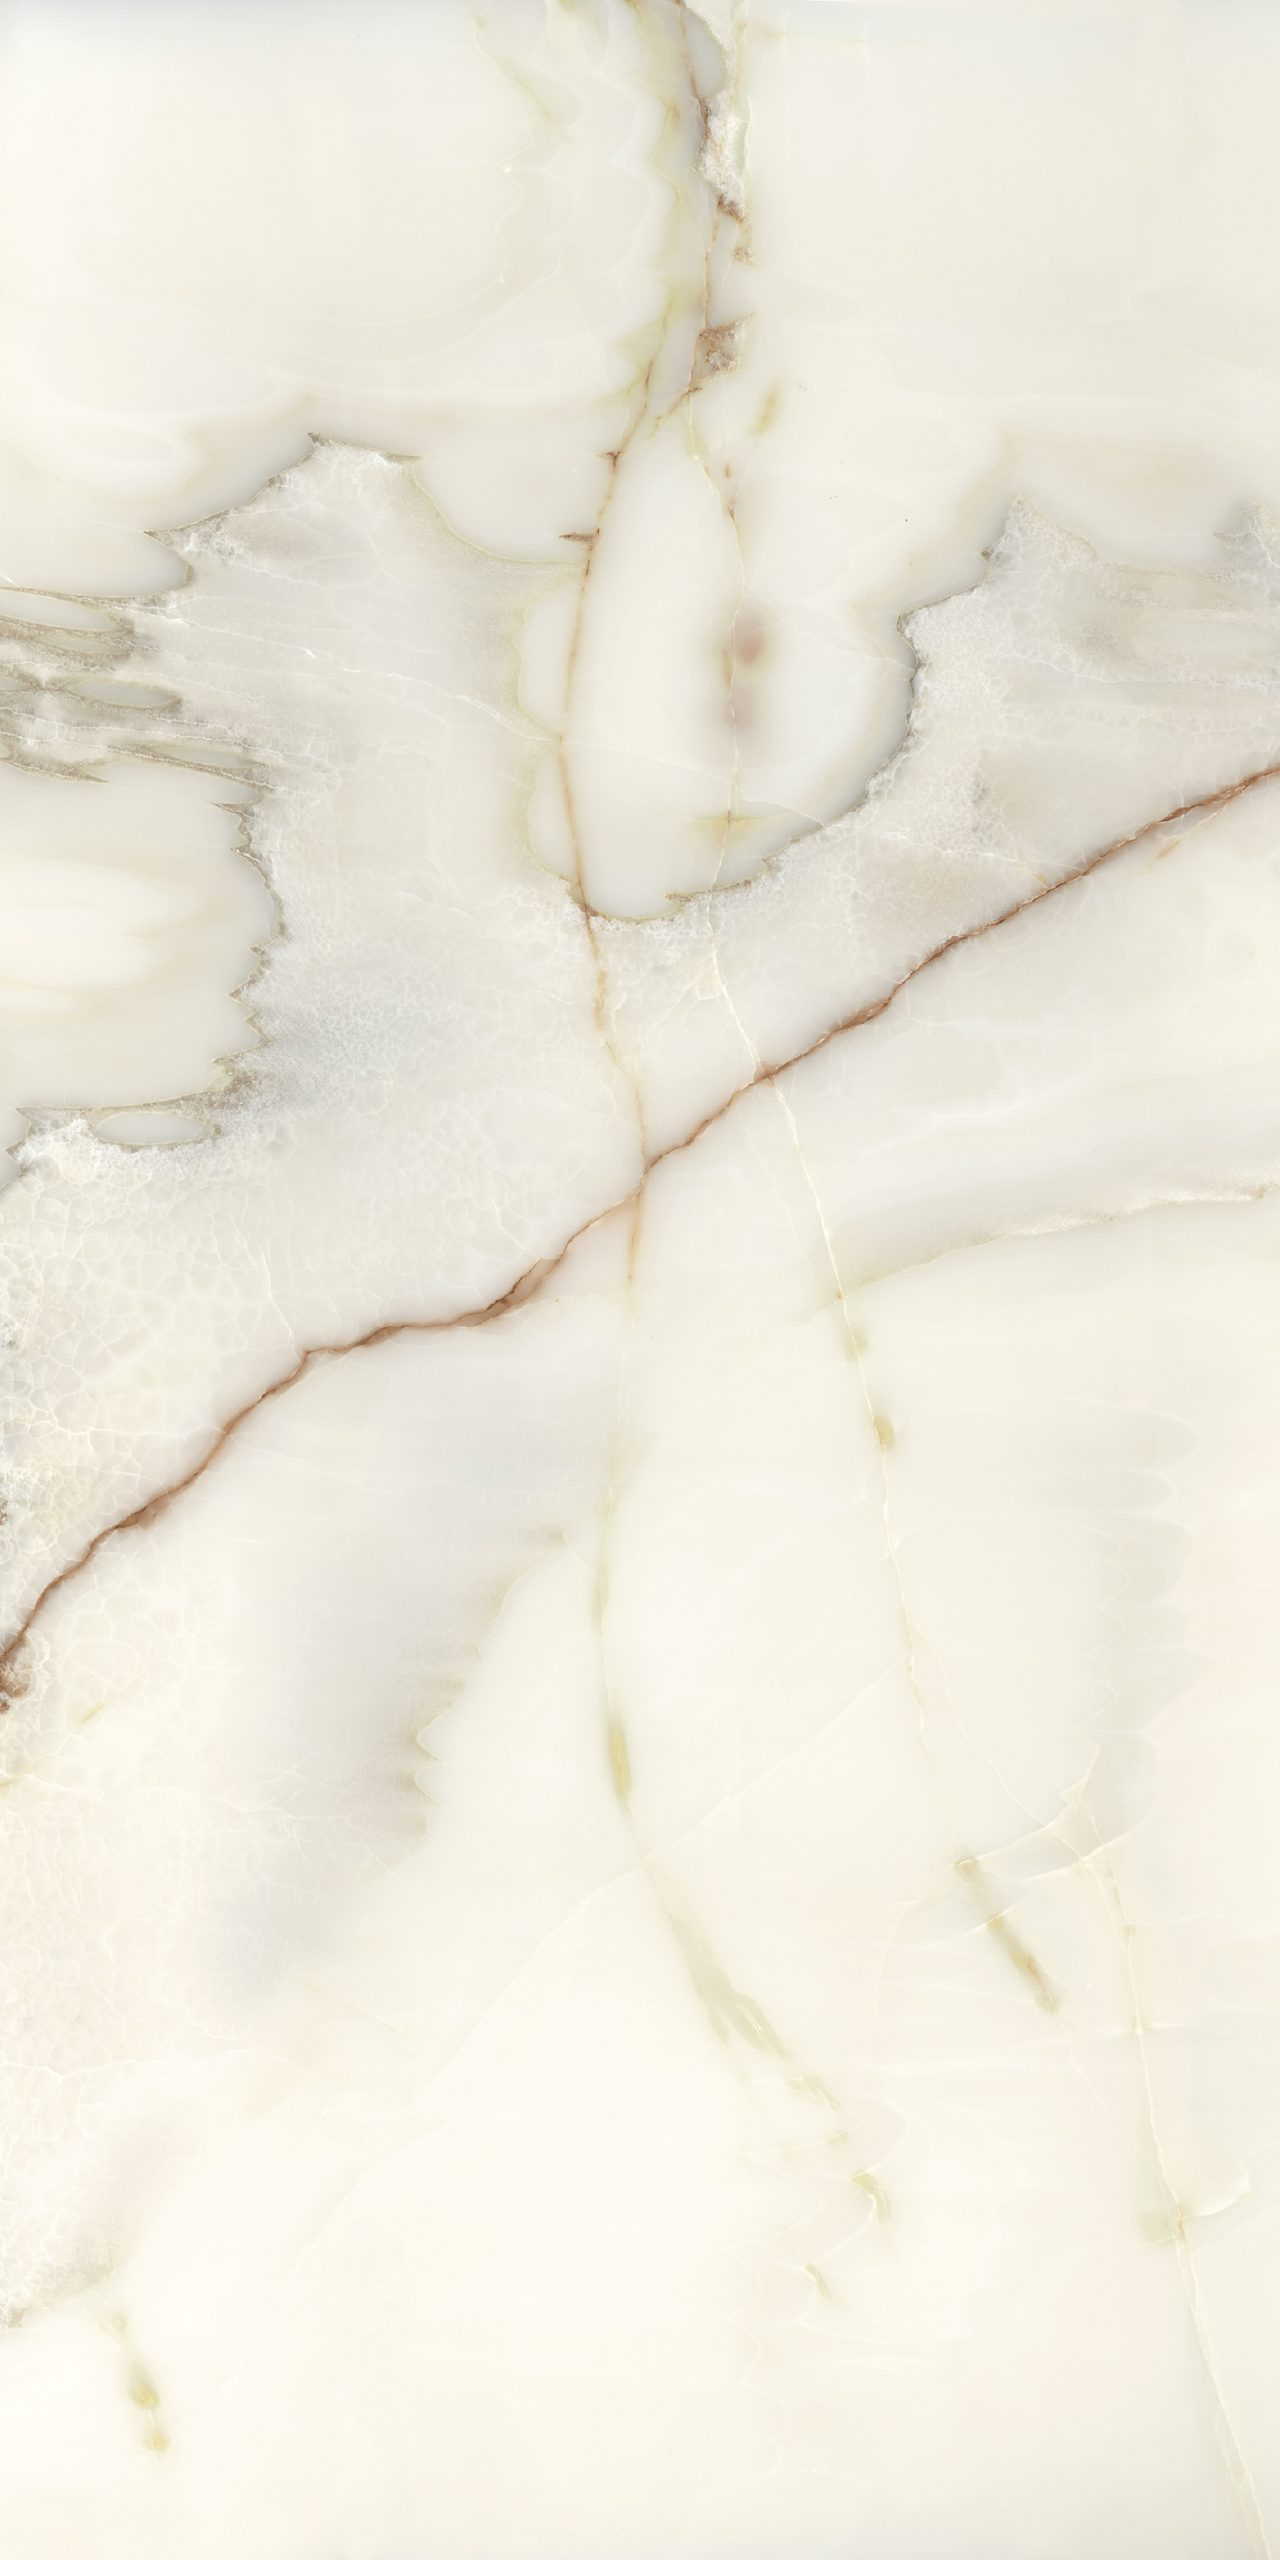 Les Bijoux de Rex Onyx Blanche Glossy 10mm 80 x 180